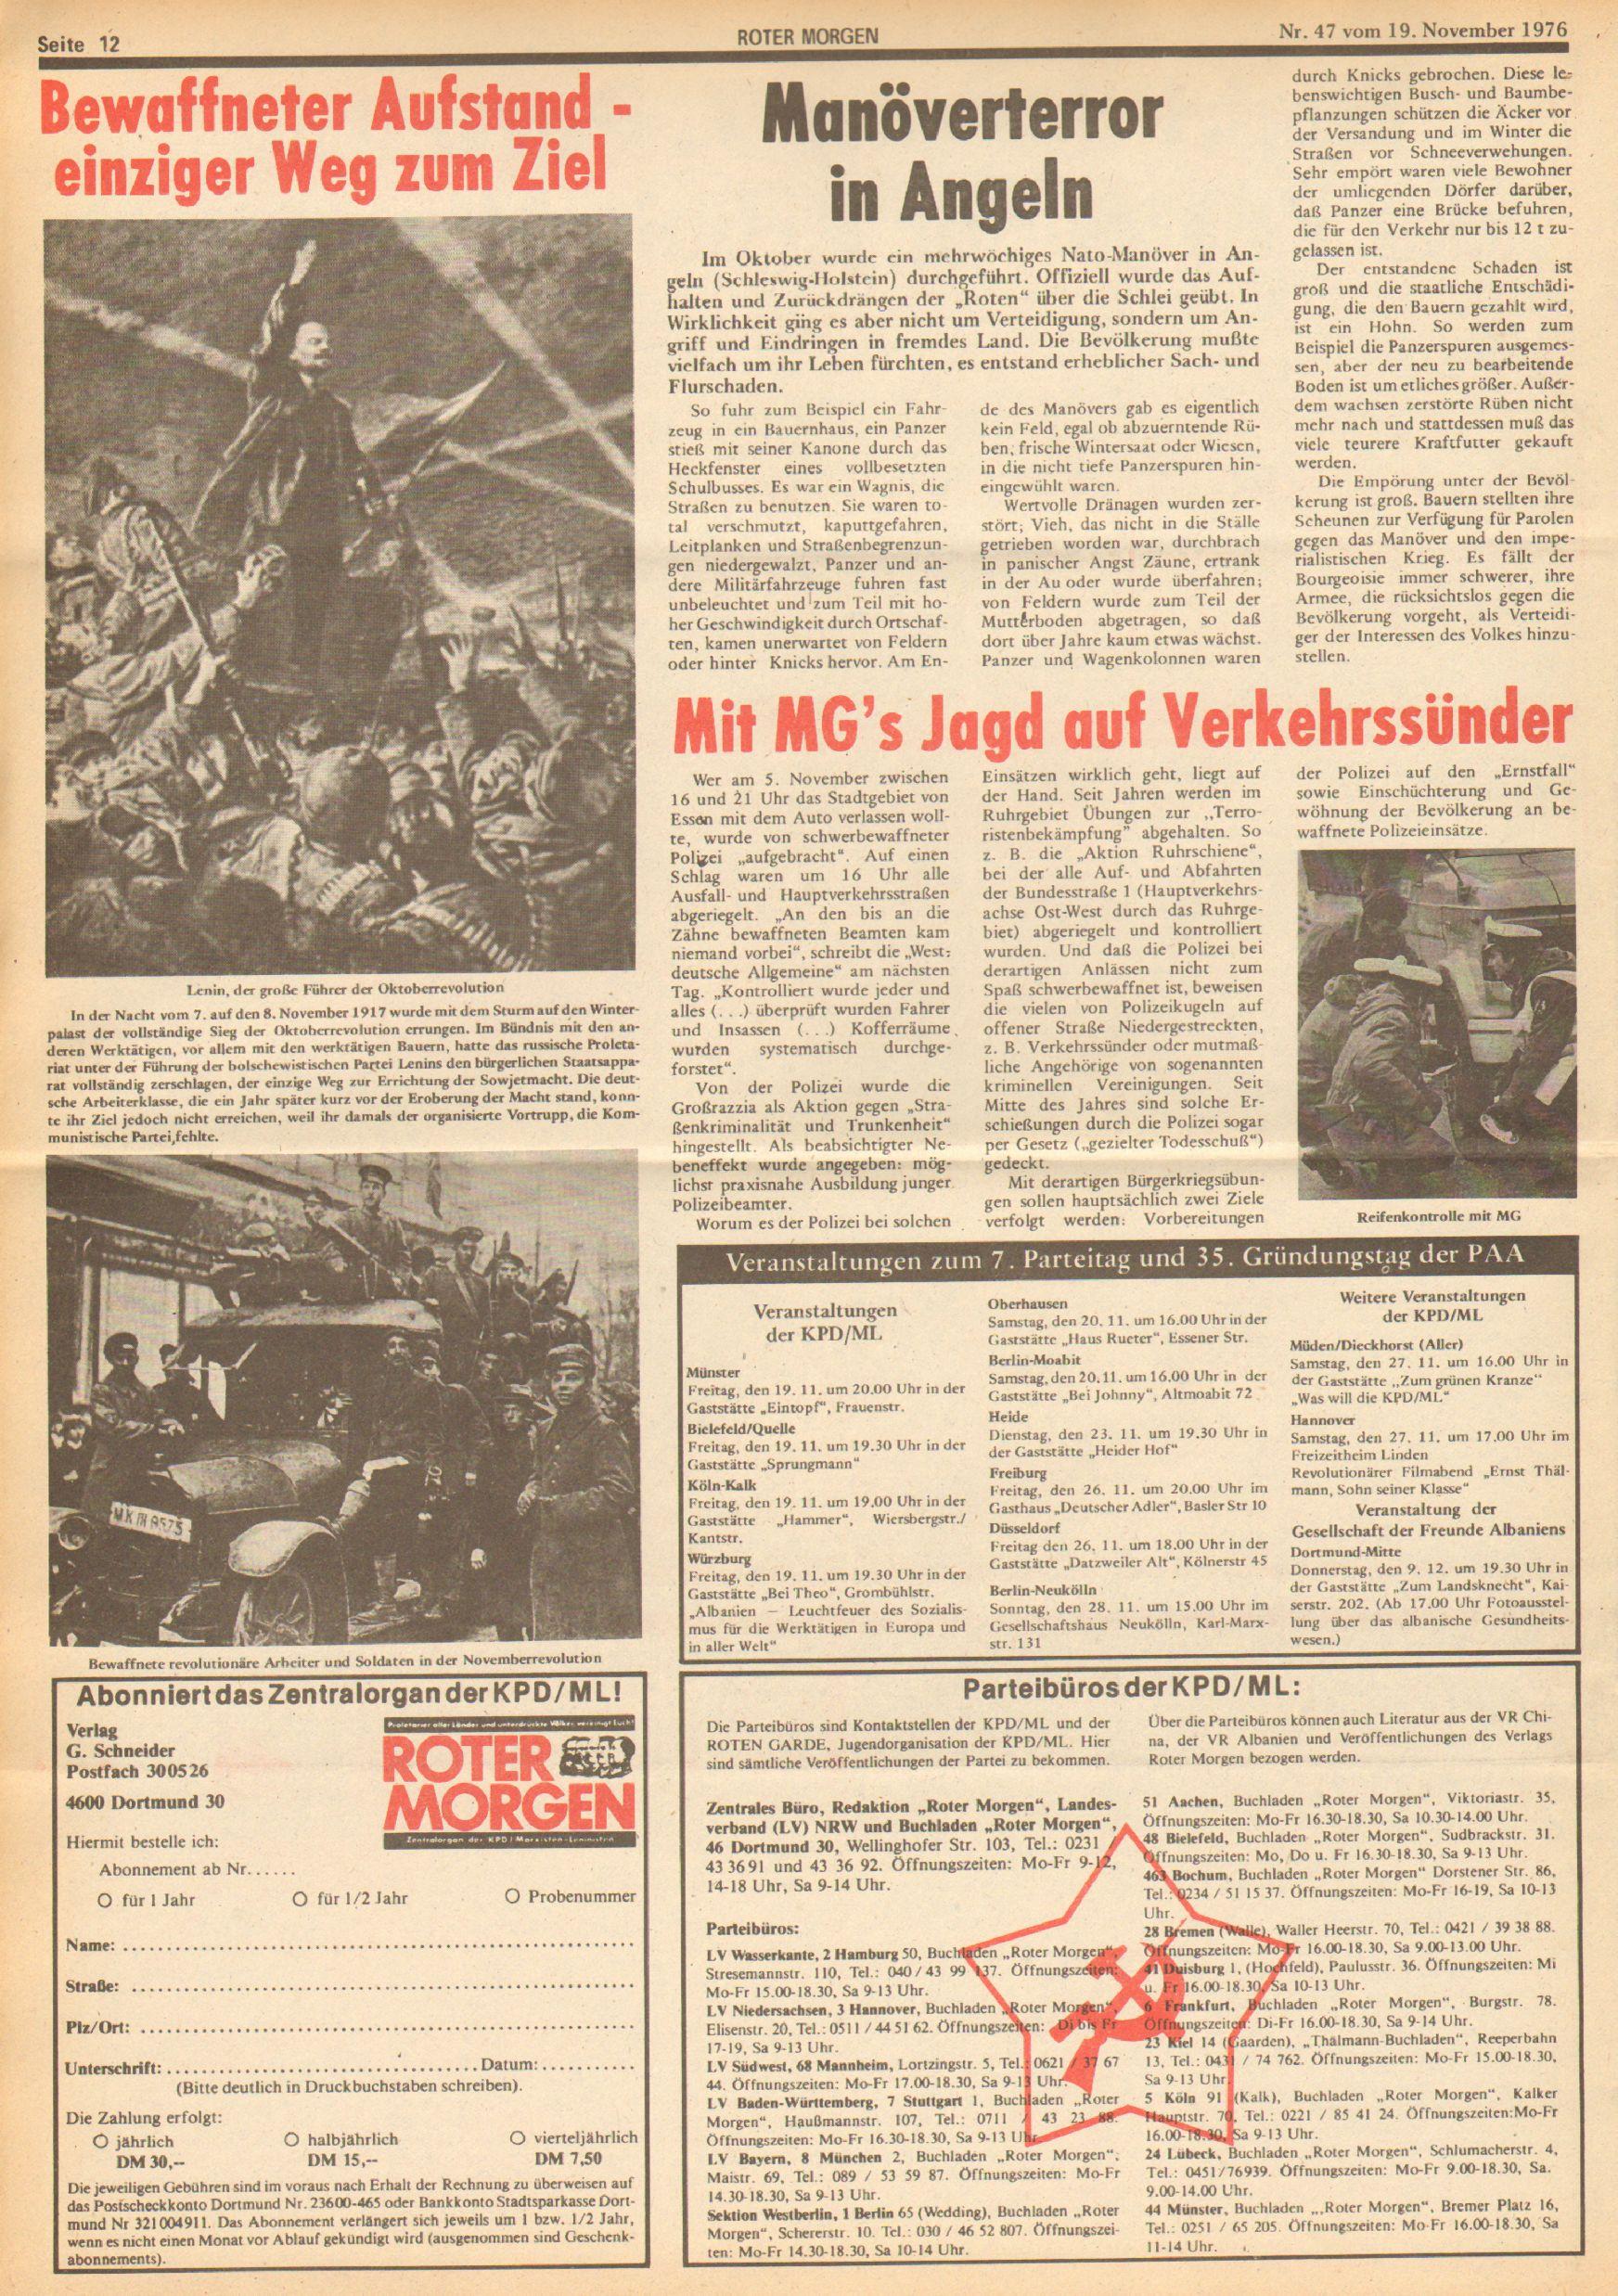 Roter Morgen, 10. Jg., 19. November 1976, Nr. 47, Seite 12